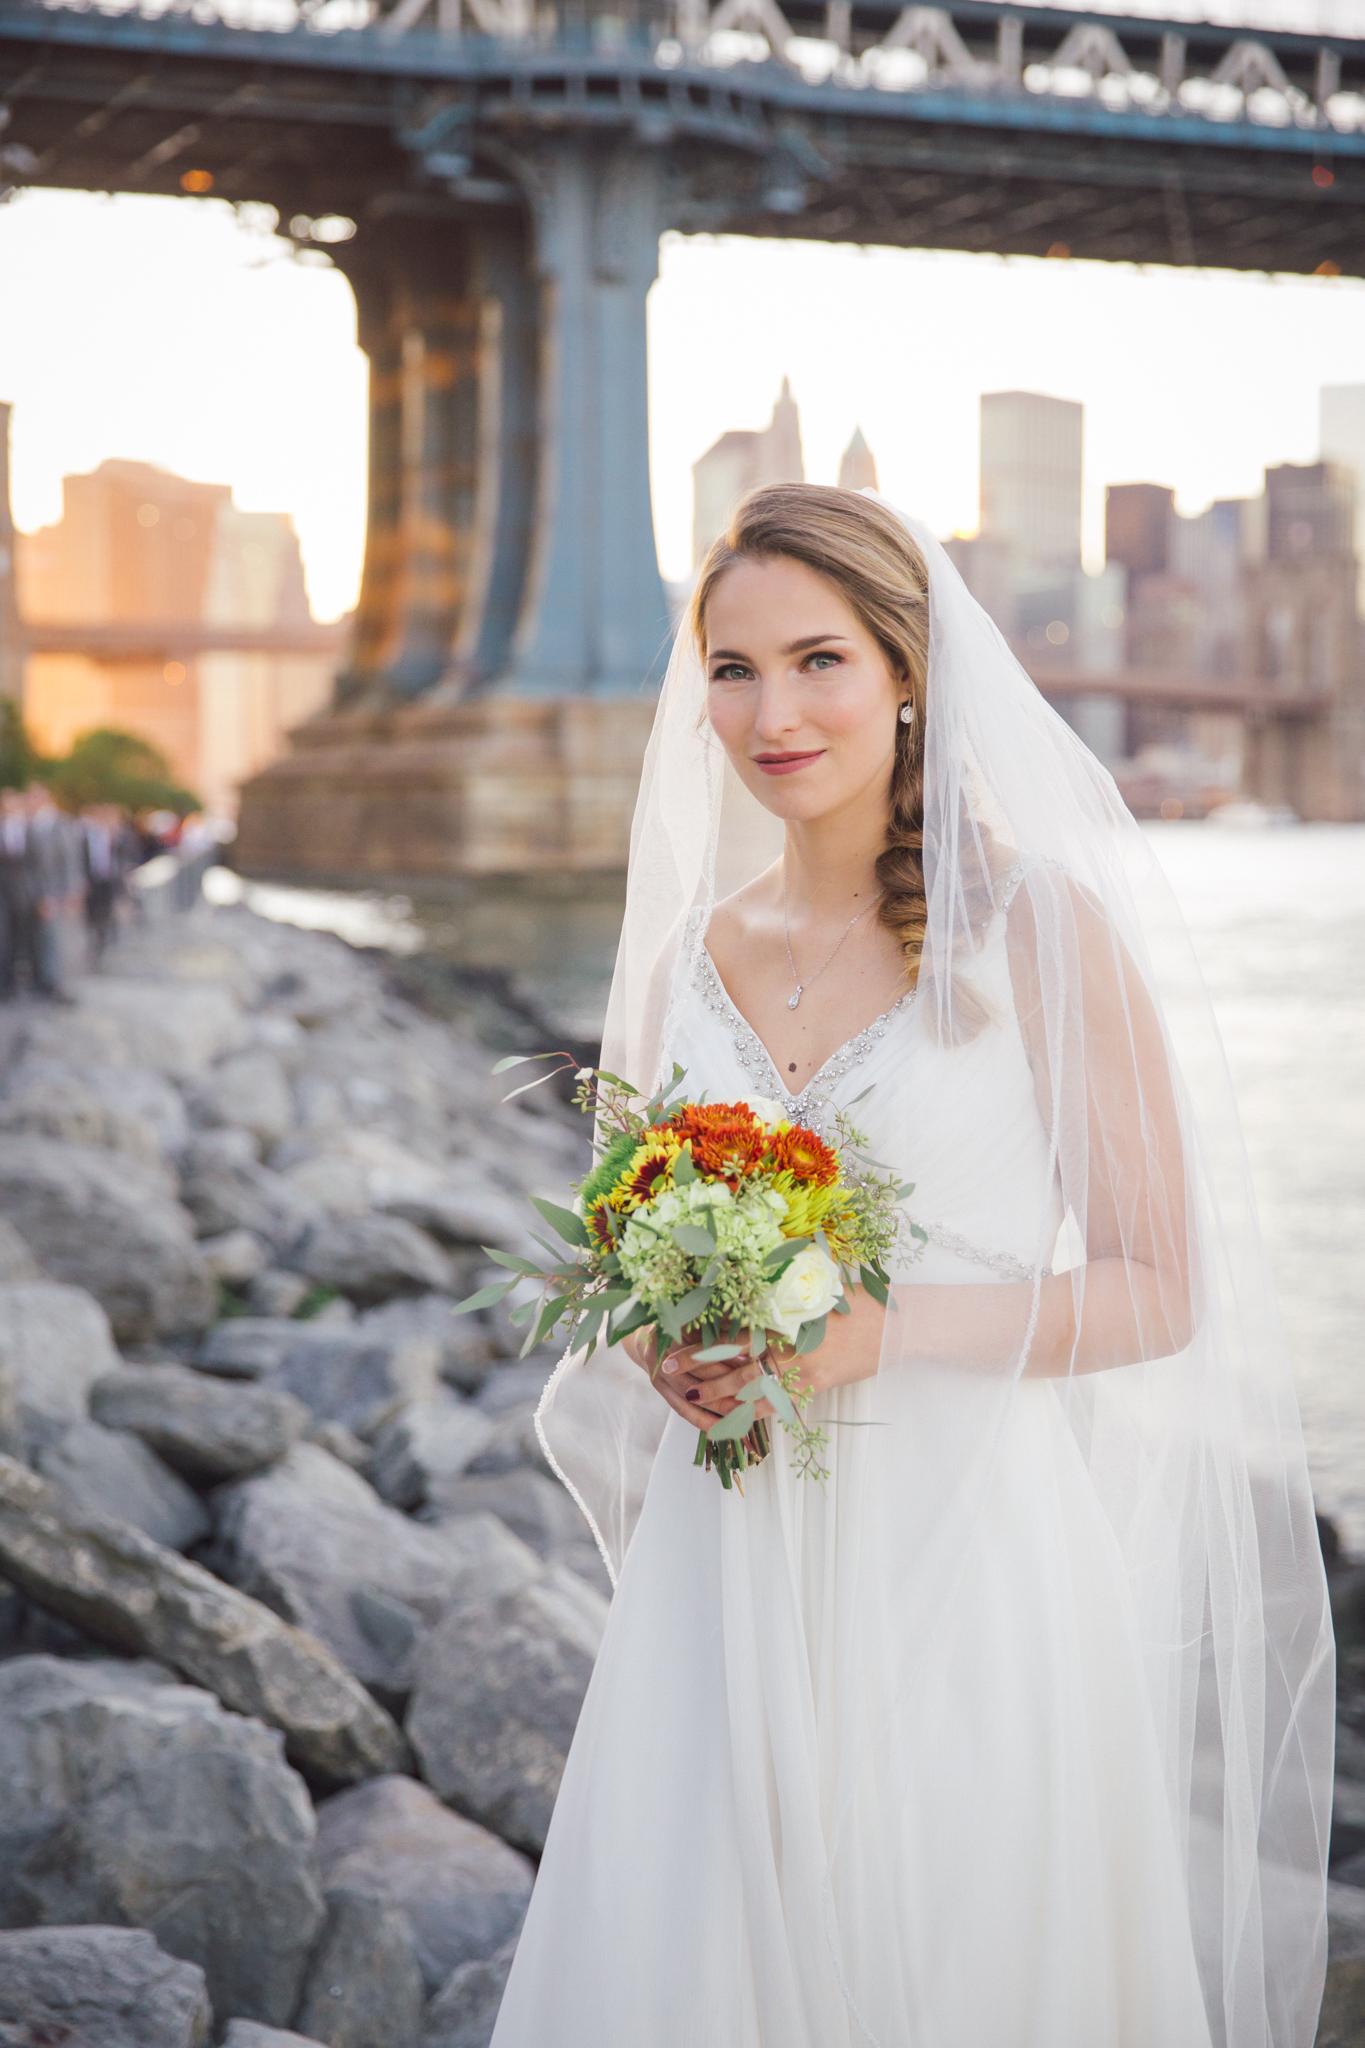 Wedding_VC_web-109.jpg